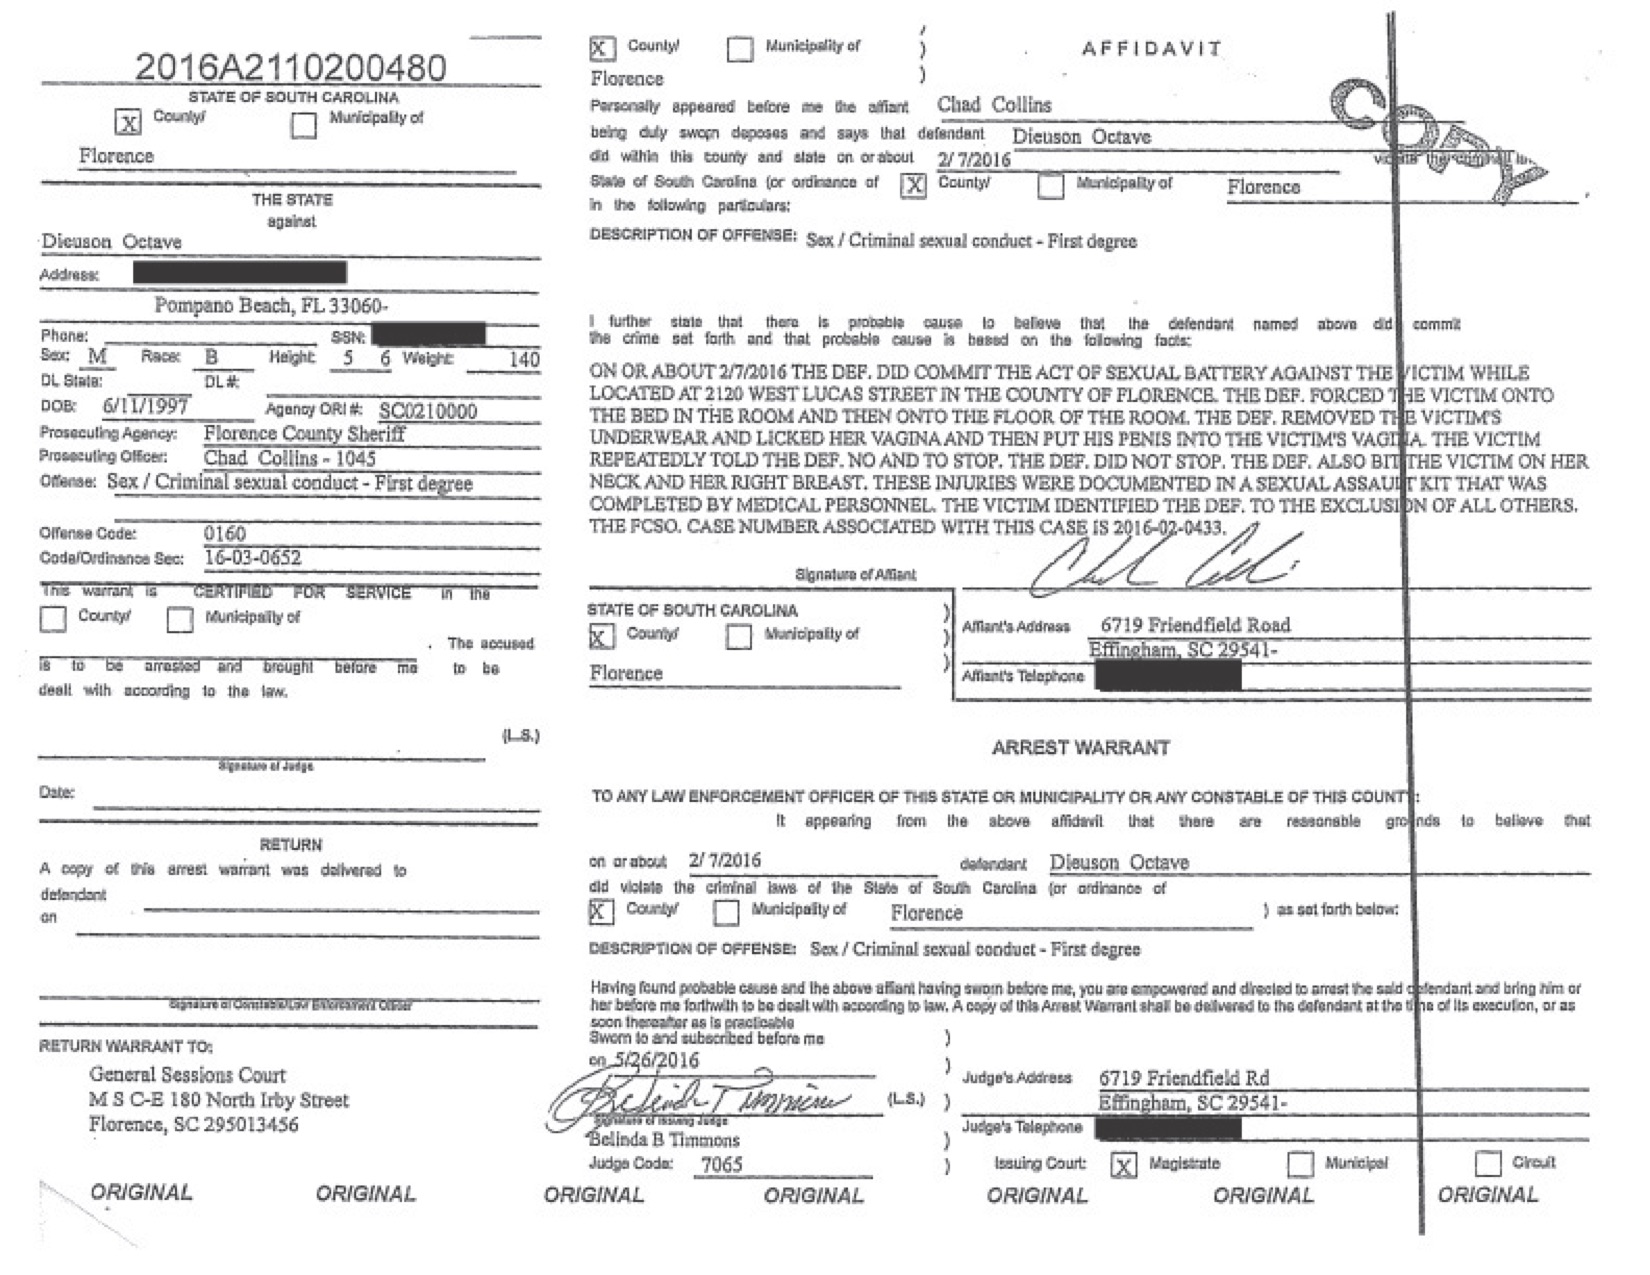 Kodak Black Sexual Battery arrest warrant